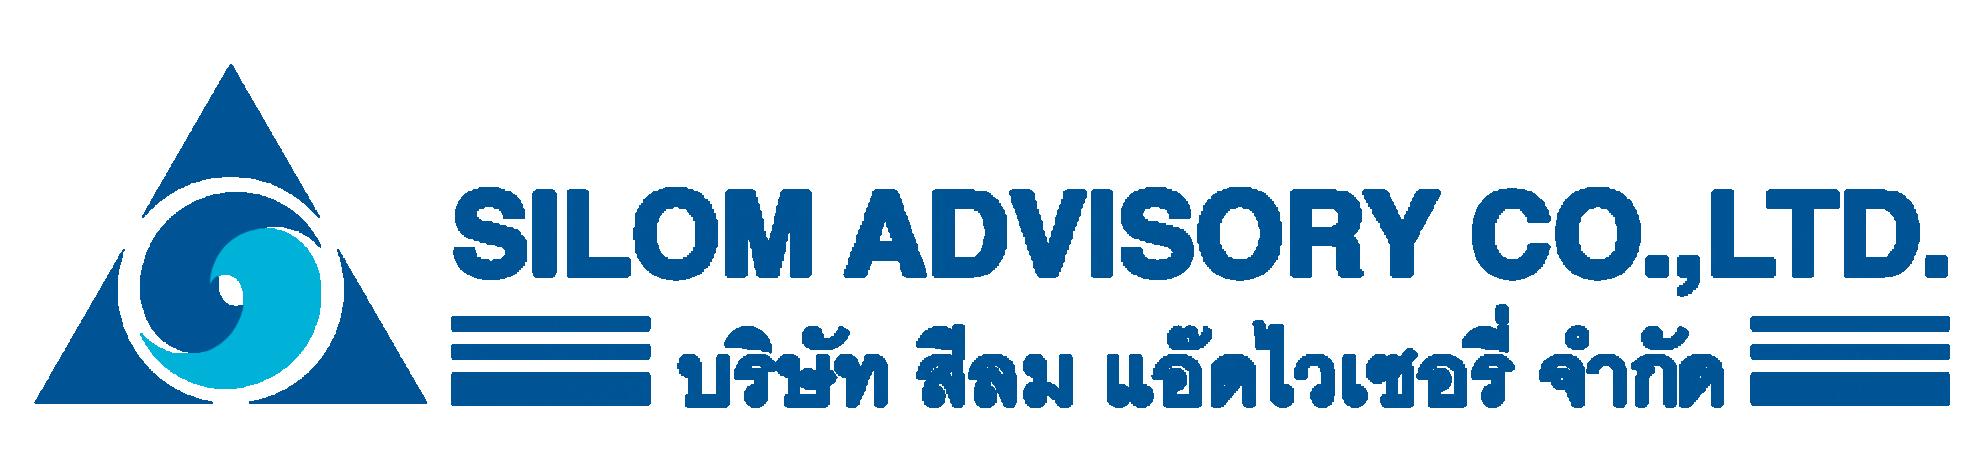 Silom Advisory Company Limited